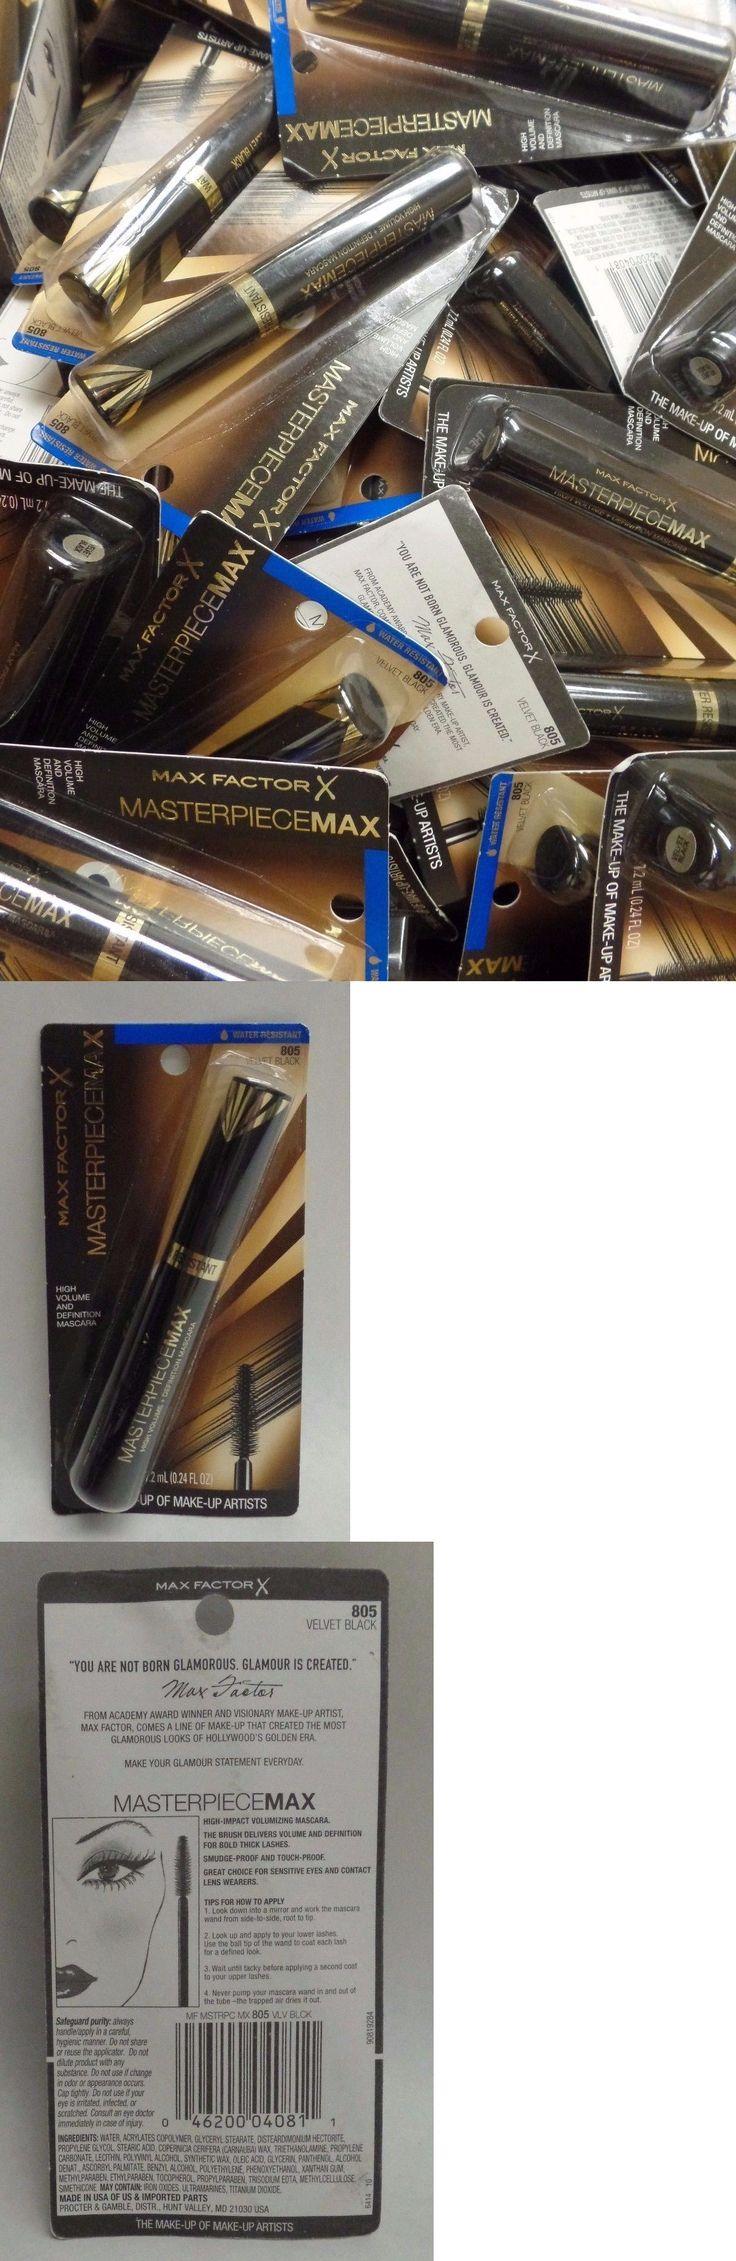 Best 25+ Max factor masterpiece max ideas on Pinterest   Max ...